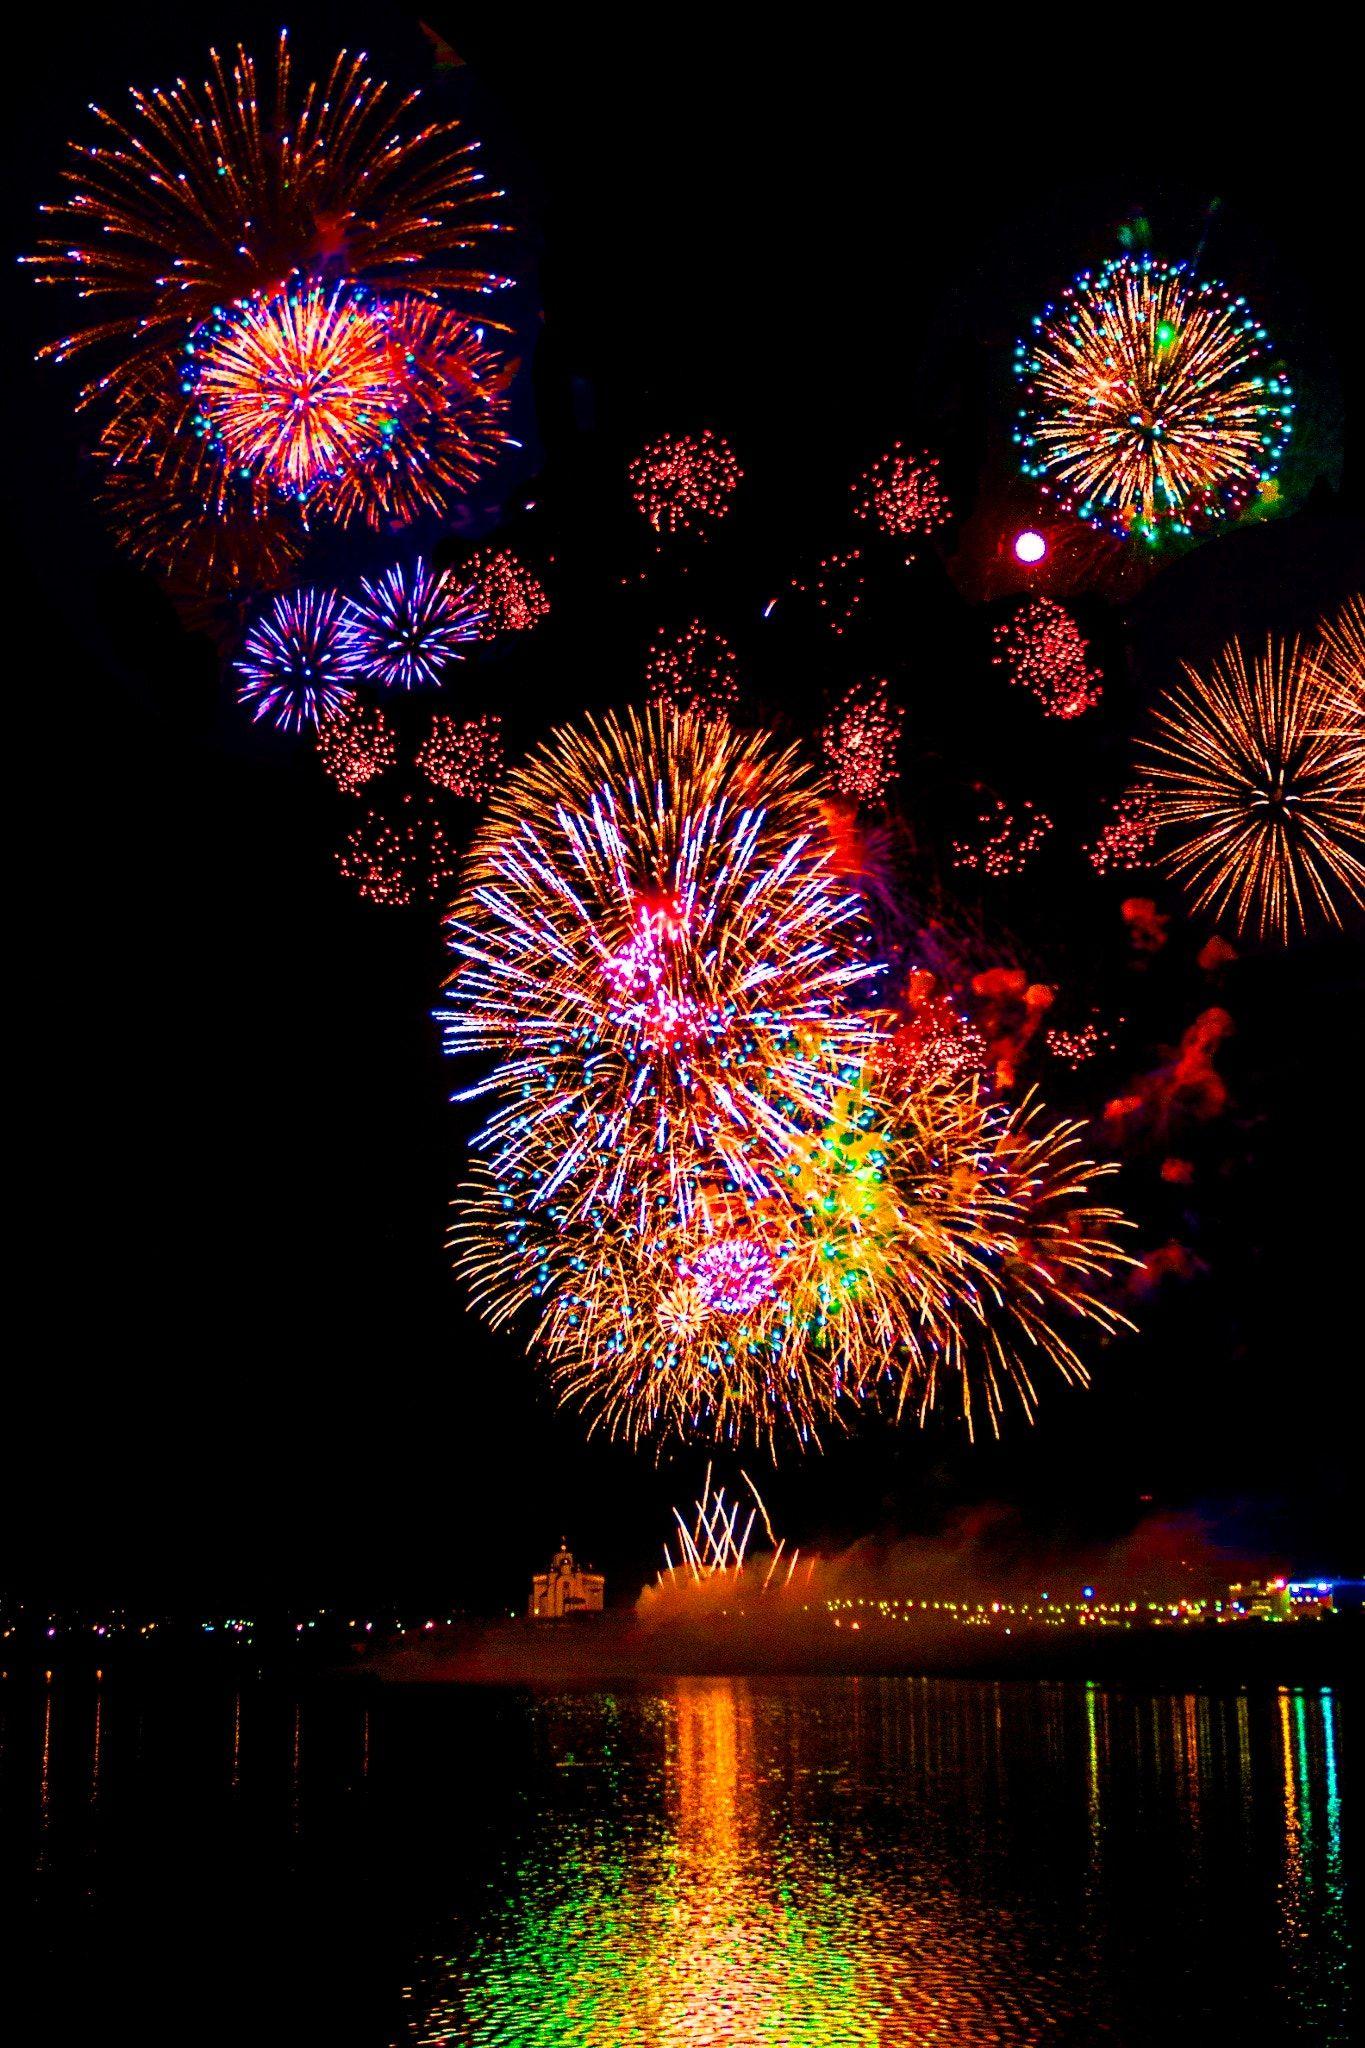 fireworks - | Fireworks art, Fireworks, Wedding fireworks